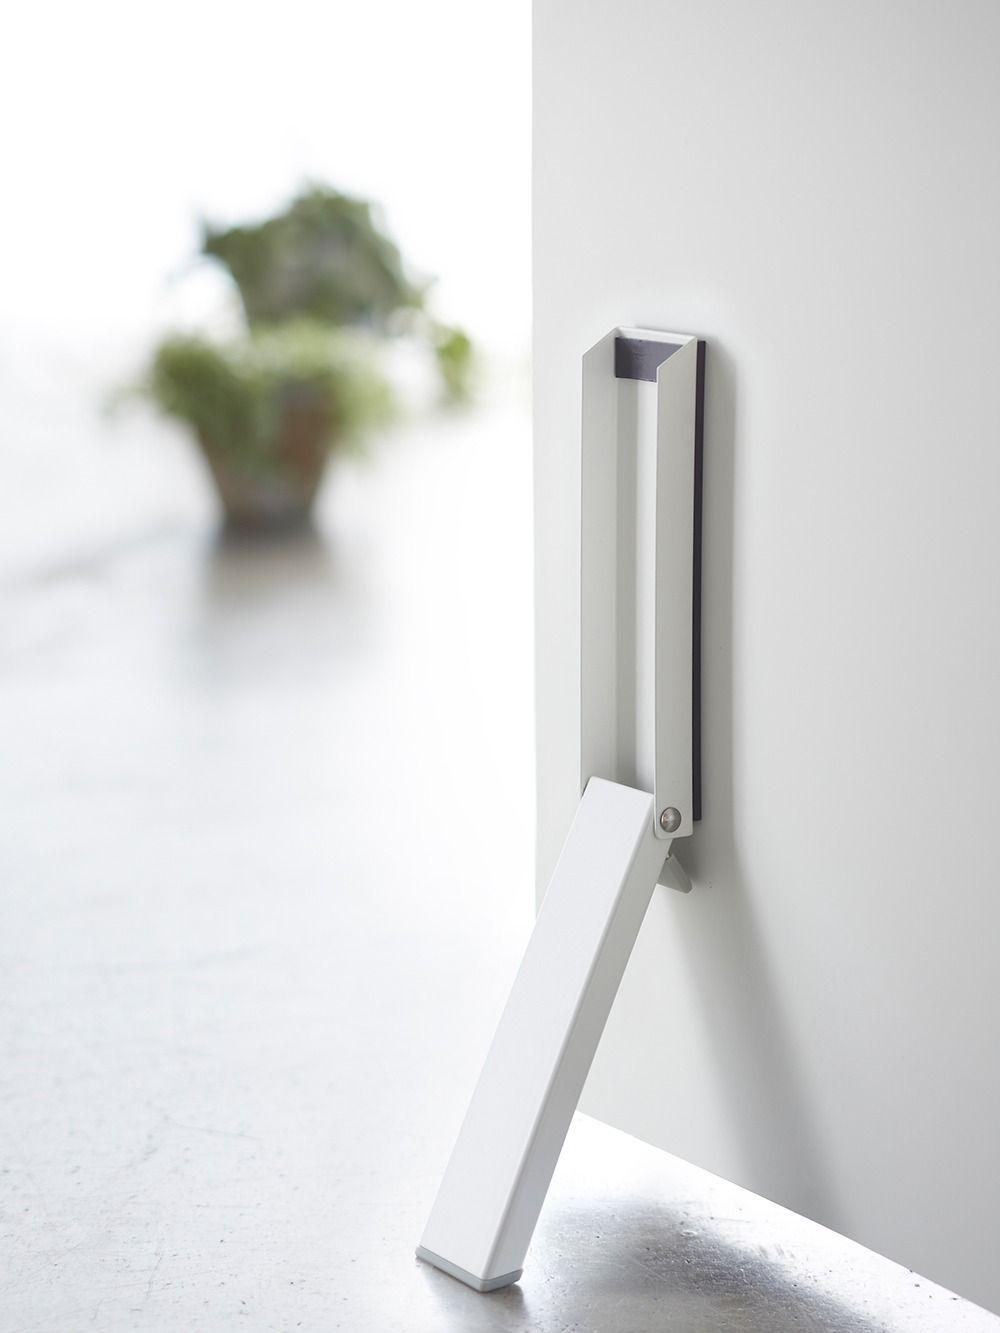 Magnetic folding door stopper smart